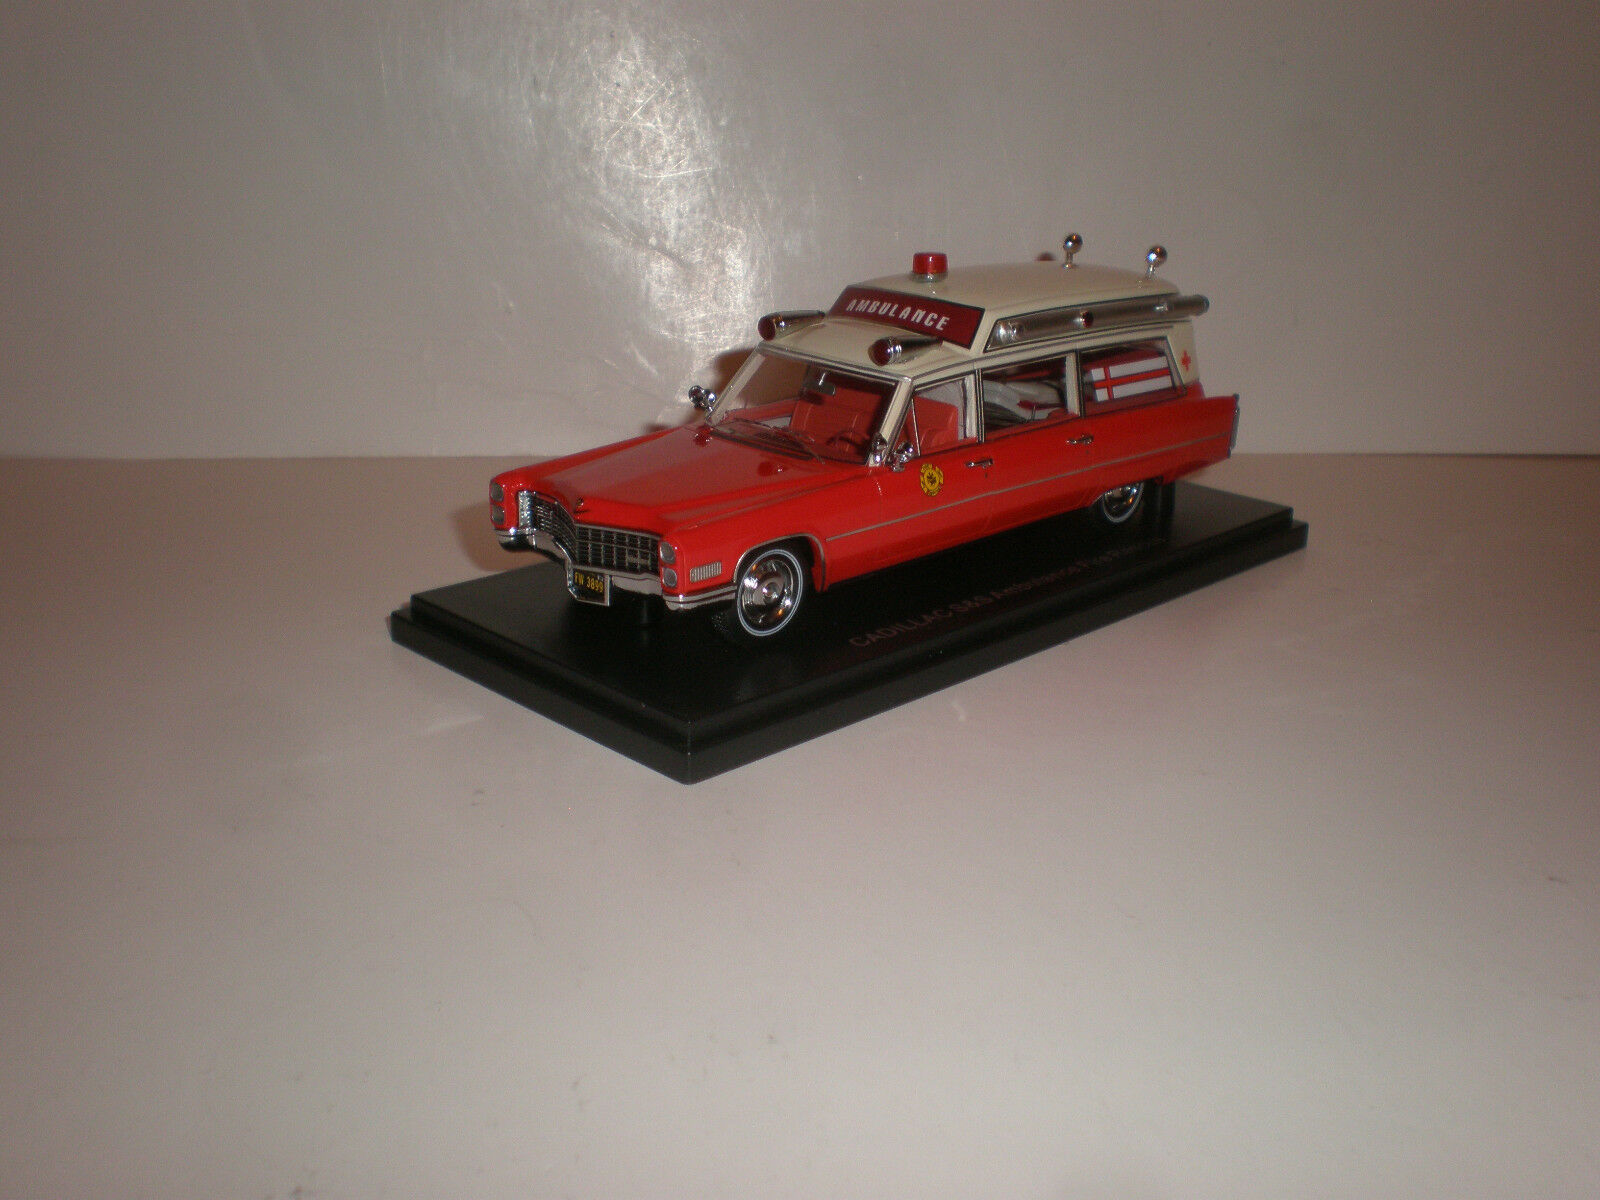 1 43 1966 Cadillac S&s Alta Top ambulancia rosso biancao Neo Scale Models NEO43899